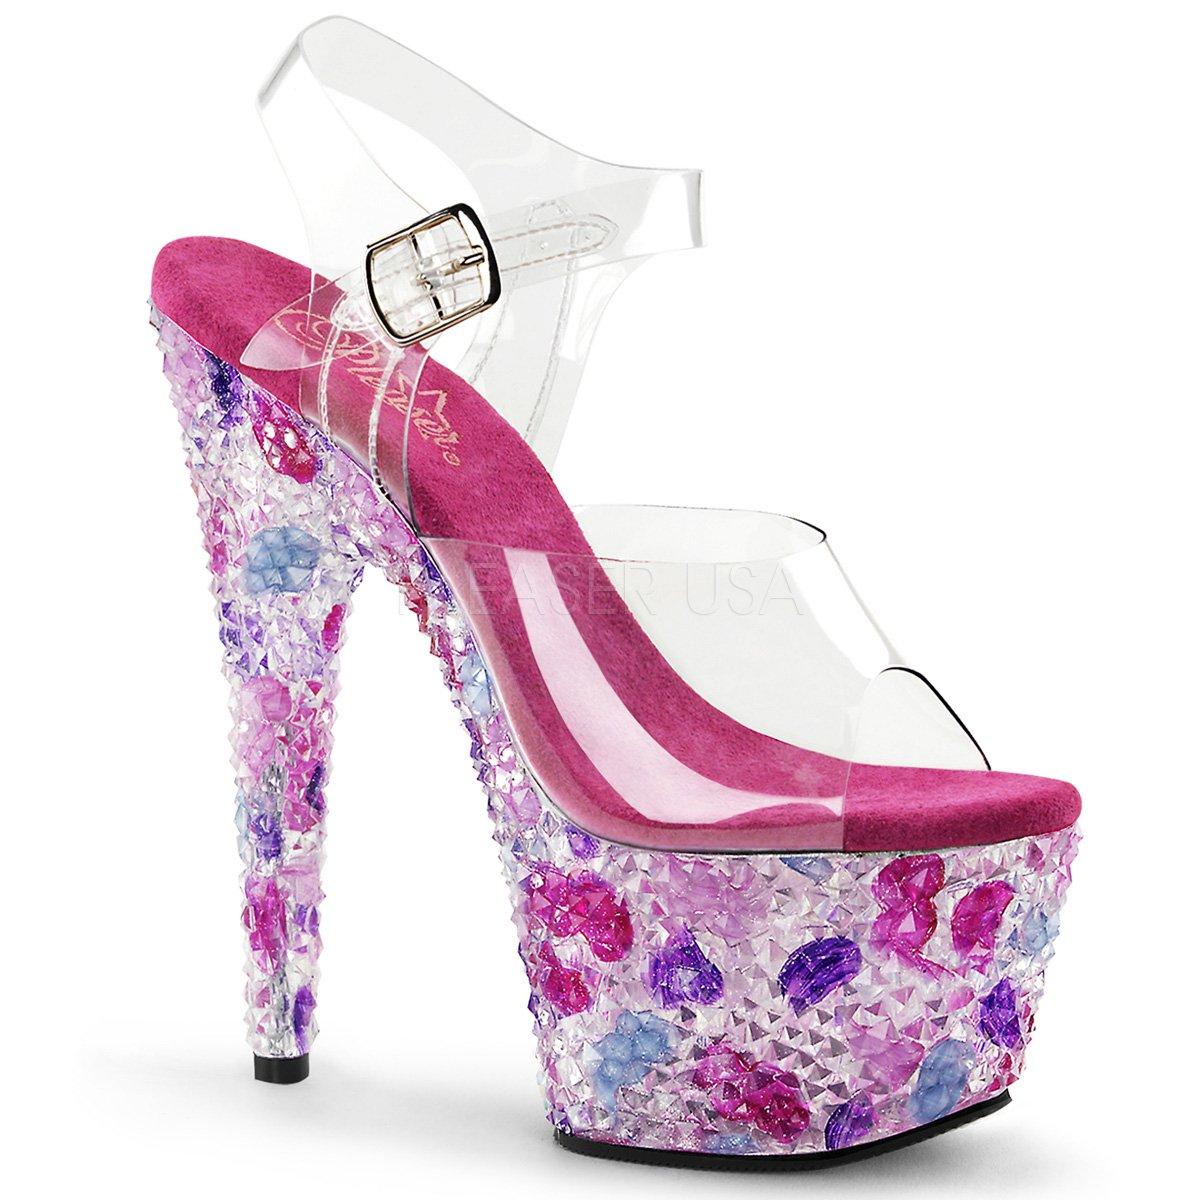 Pleaser Crystalize-708 sexy High Heels Strass Poledance Gogo Strass Heels Sandaletten Transparent Hot Rosa Fuchsia 35-41 7094ce